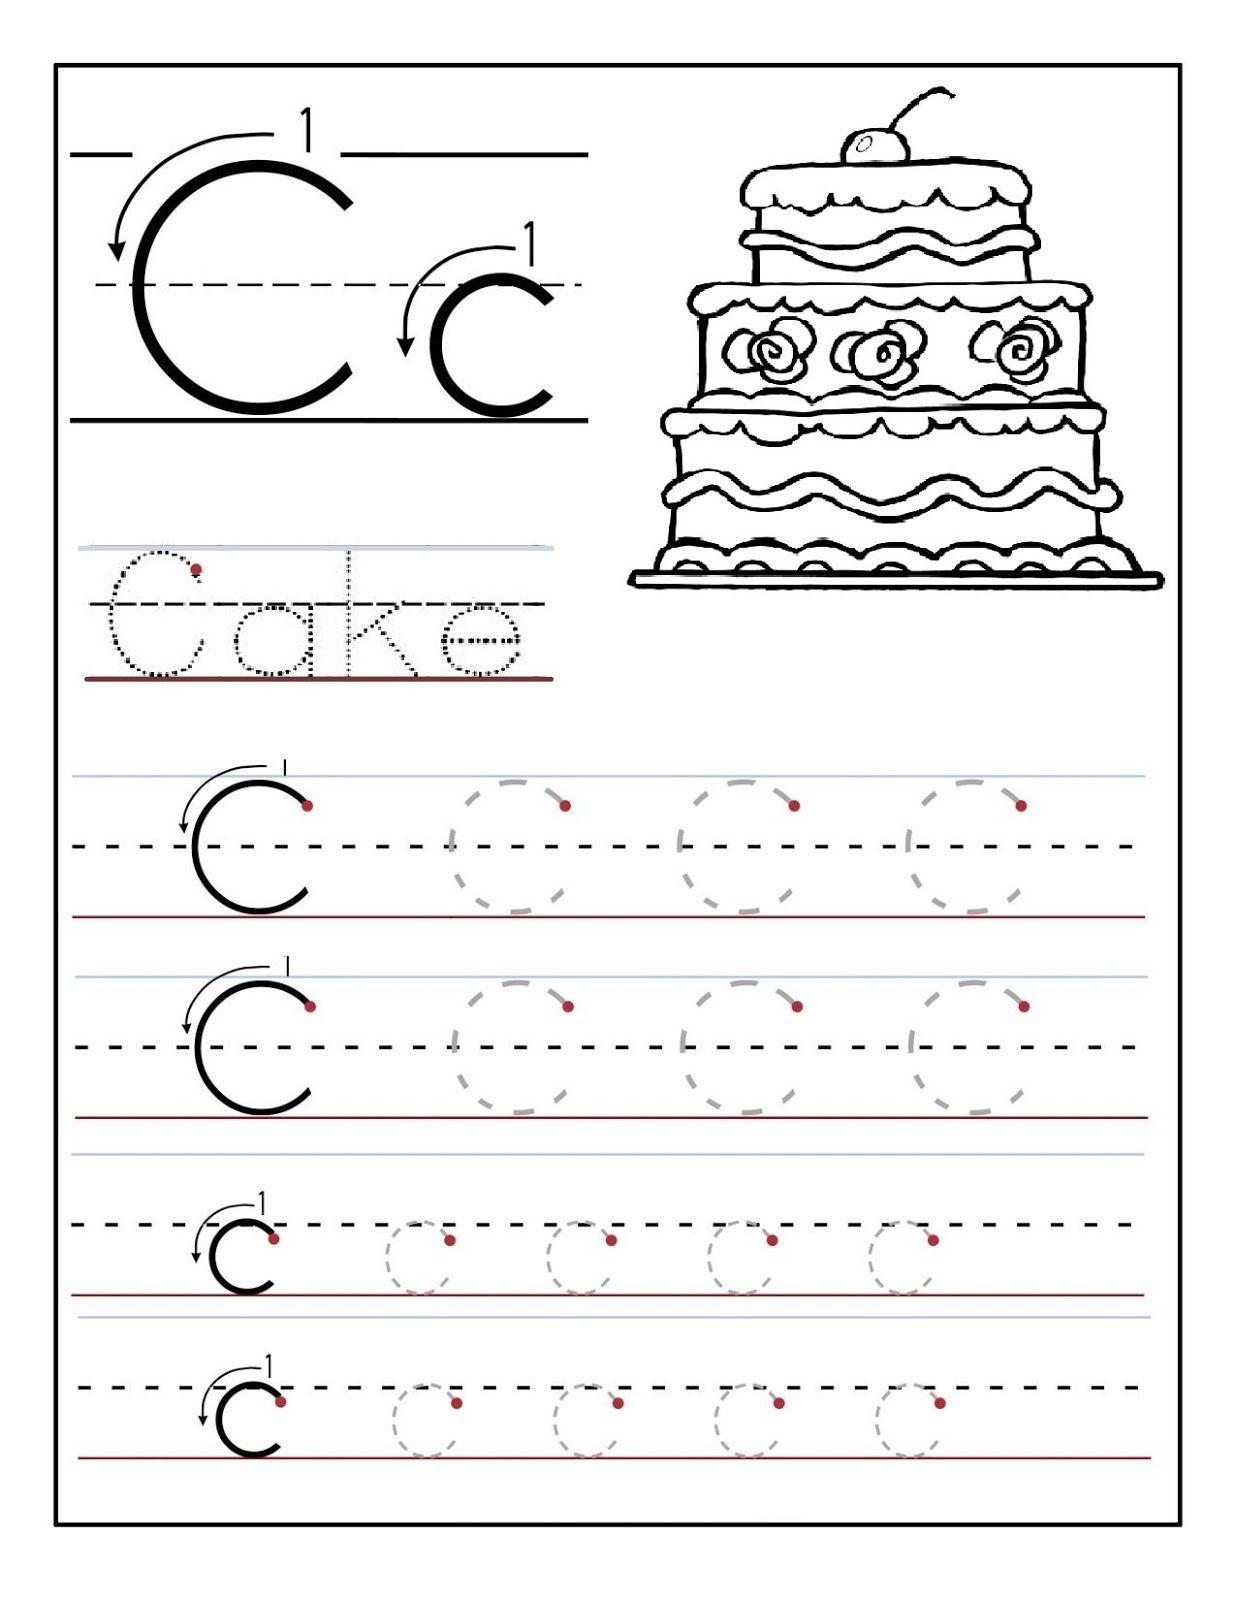 kids learning sheets printable k5 worksheets alphabet and numbers learning preschool. Black Bedroom Furniture Sets. Home Design Ideas